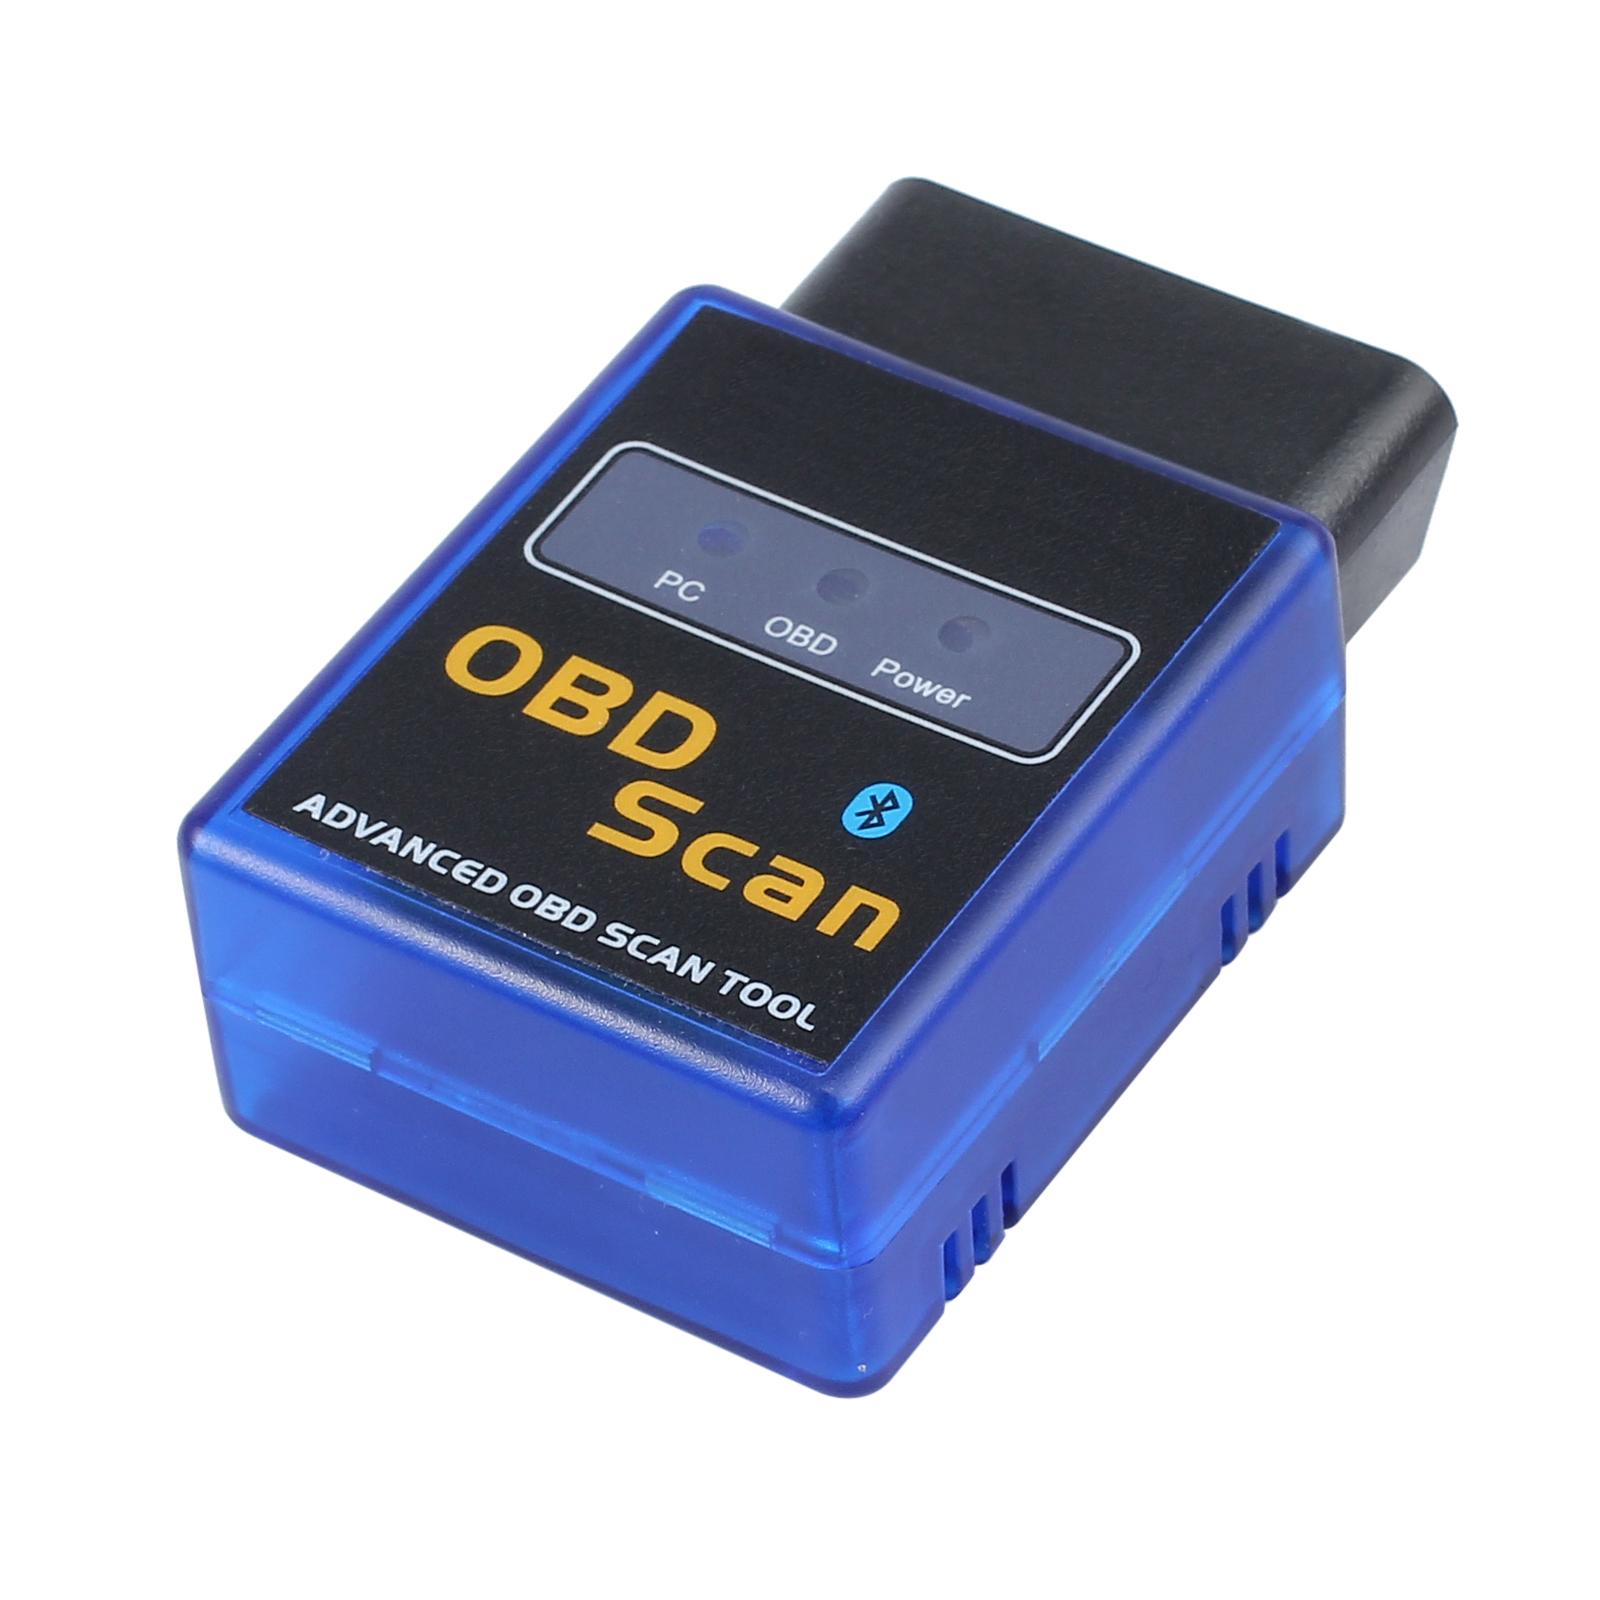 ignition switch and obd live data volvo v70 wiring diagram 2000 bluetooth car obdii diagnostic code scanner reader scan